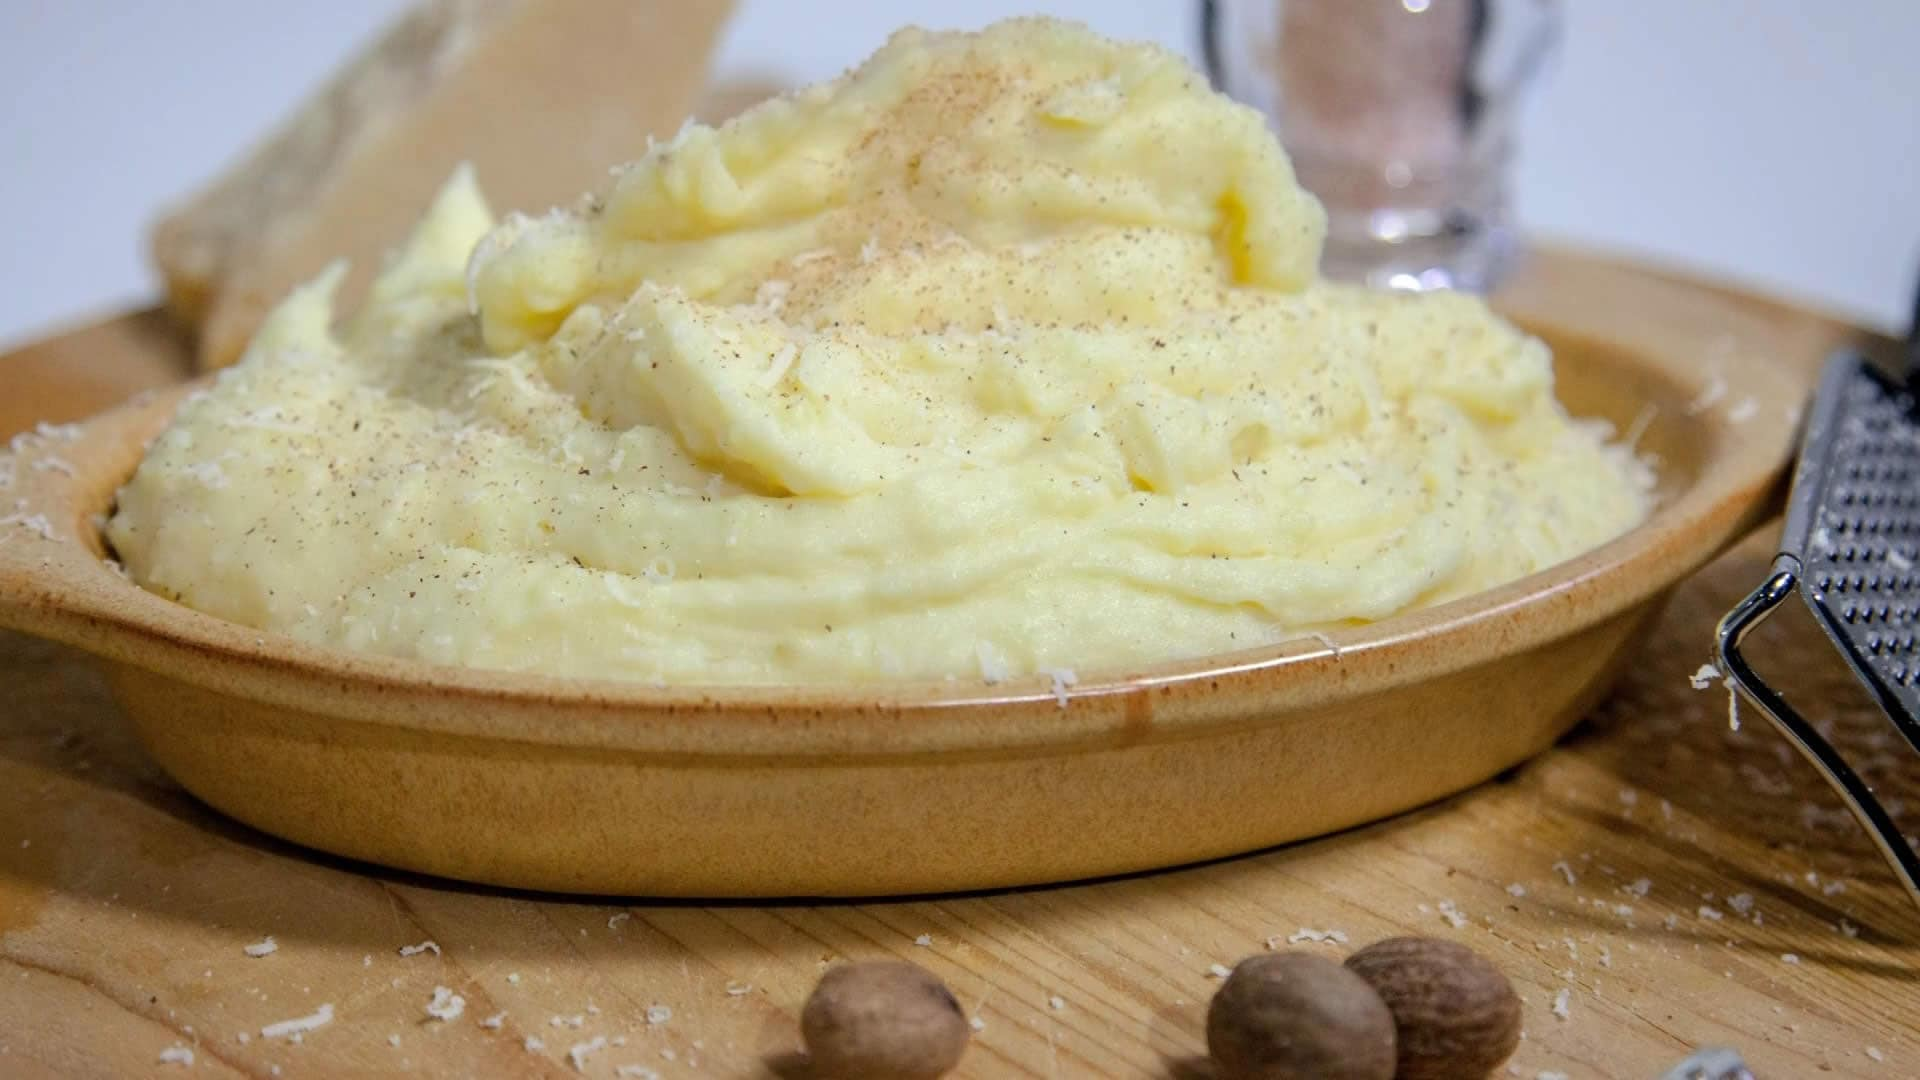 Foto Purè di Patate Senza Burro - Come prepararlo in casa